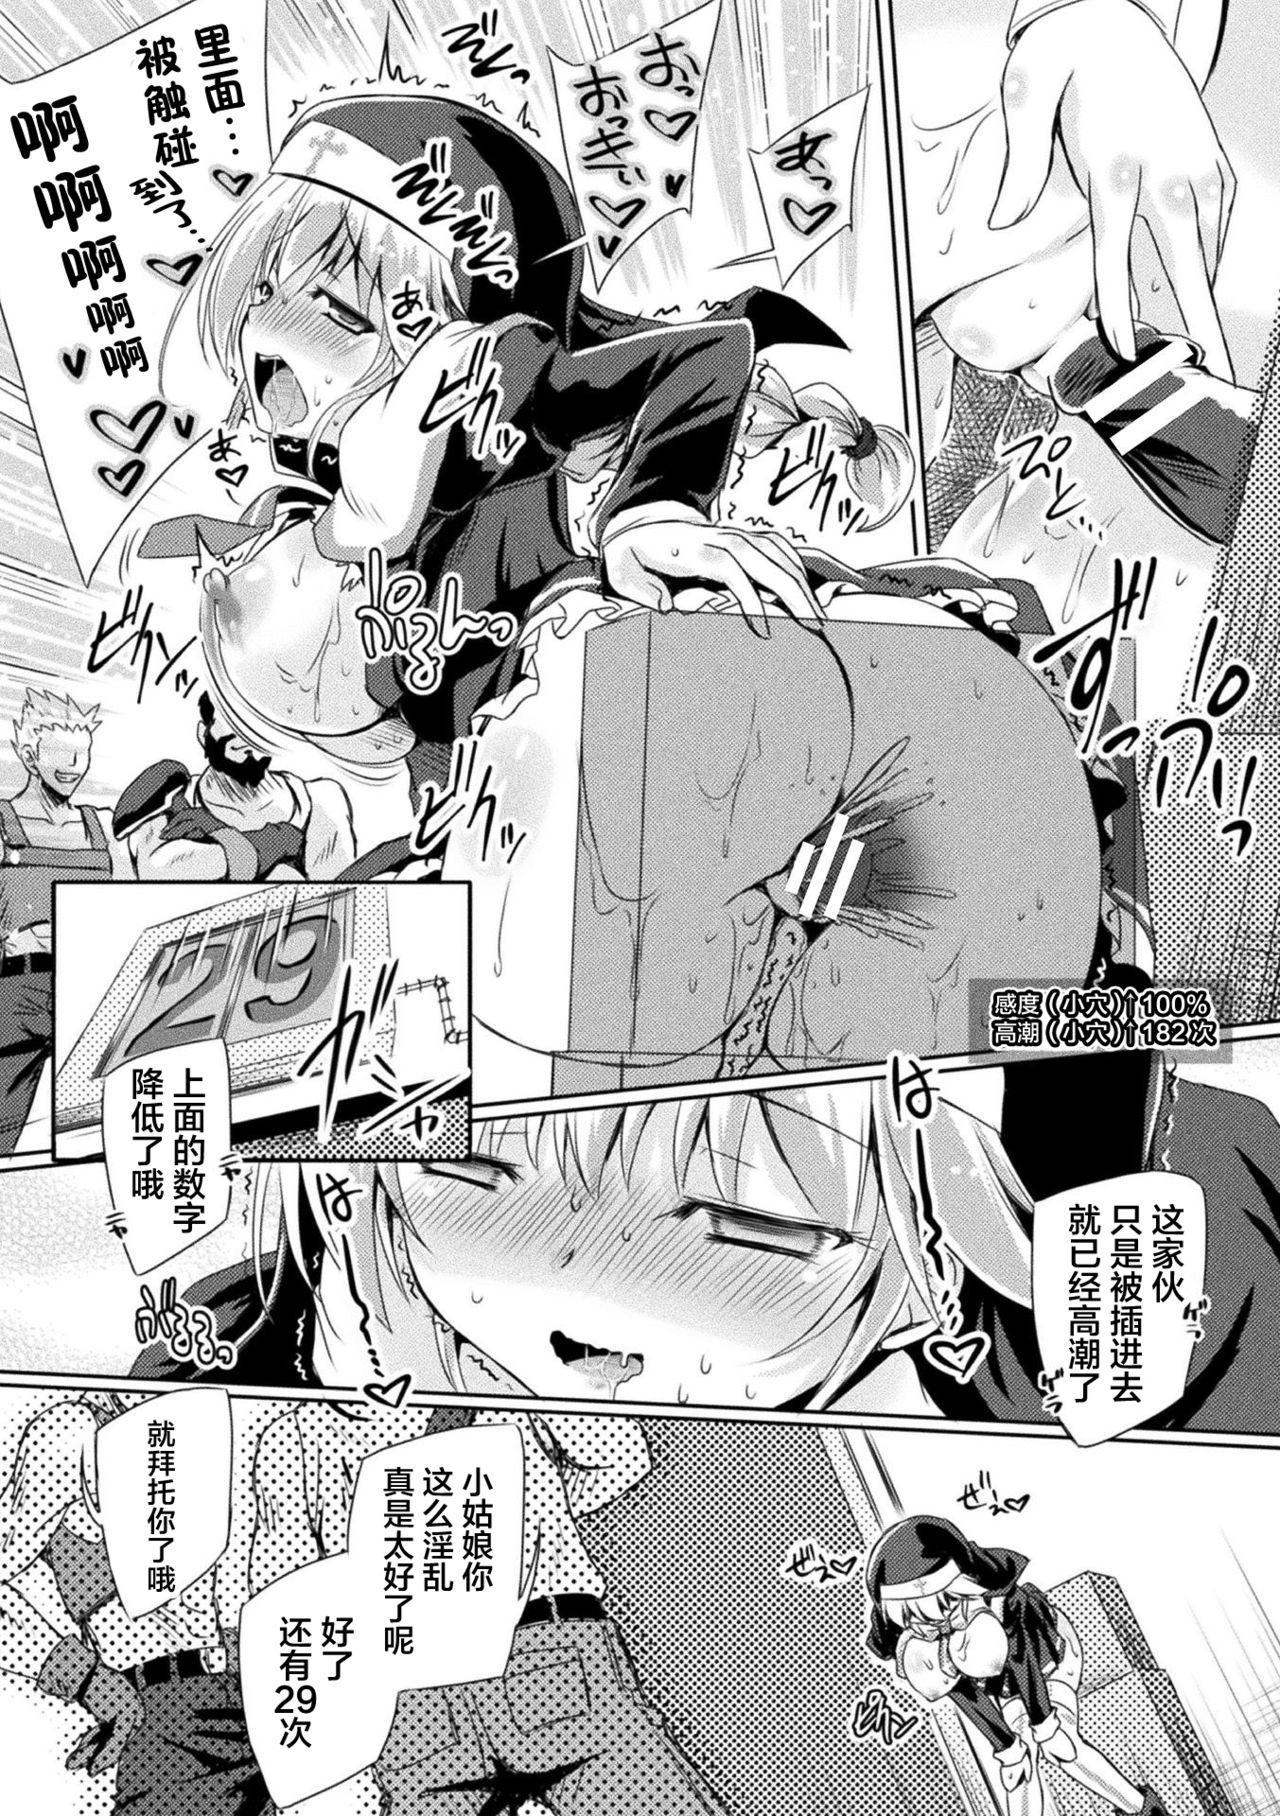 2D Comic Magazine Zecchou Kairaku ga Tomaranai Ero-Trap Dungeon Vol. 1 34